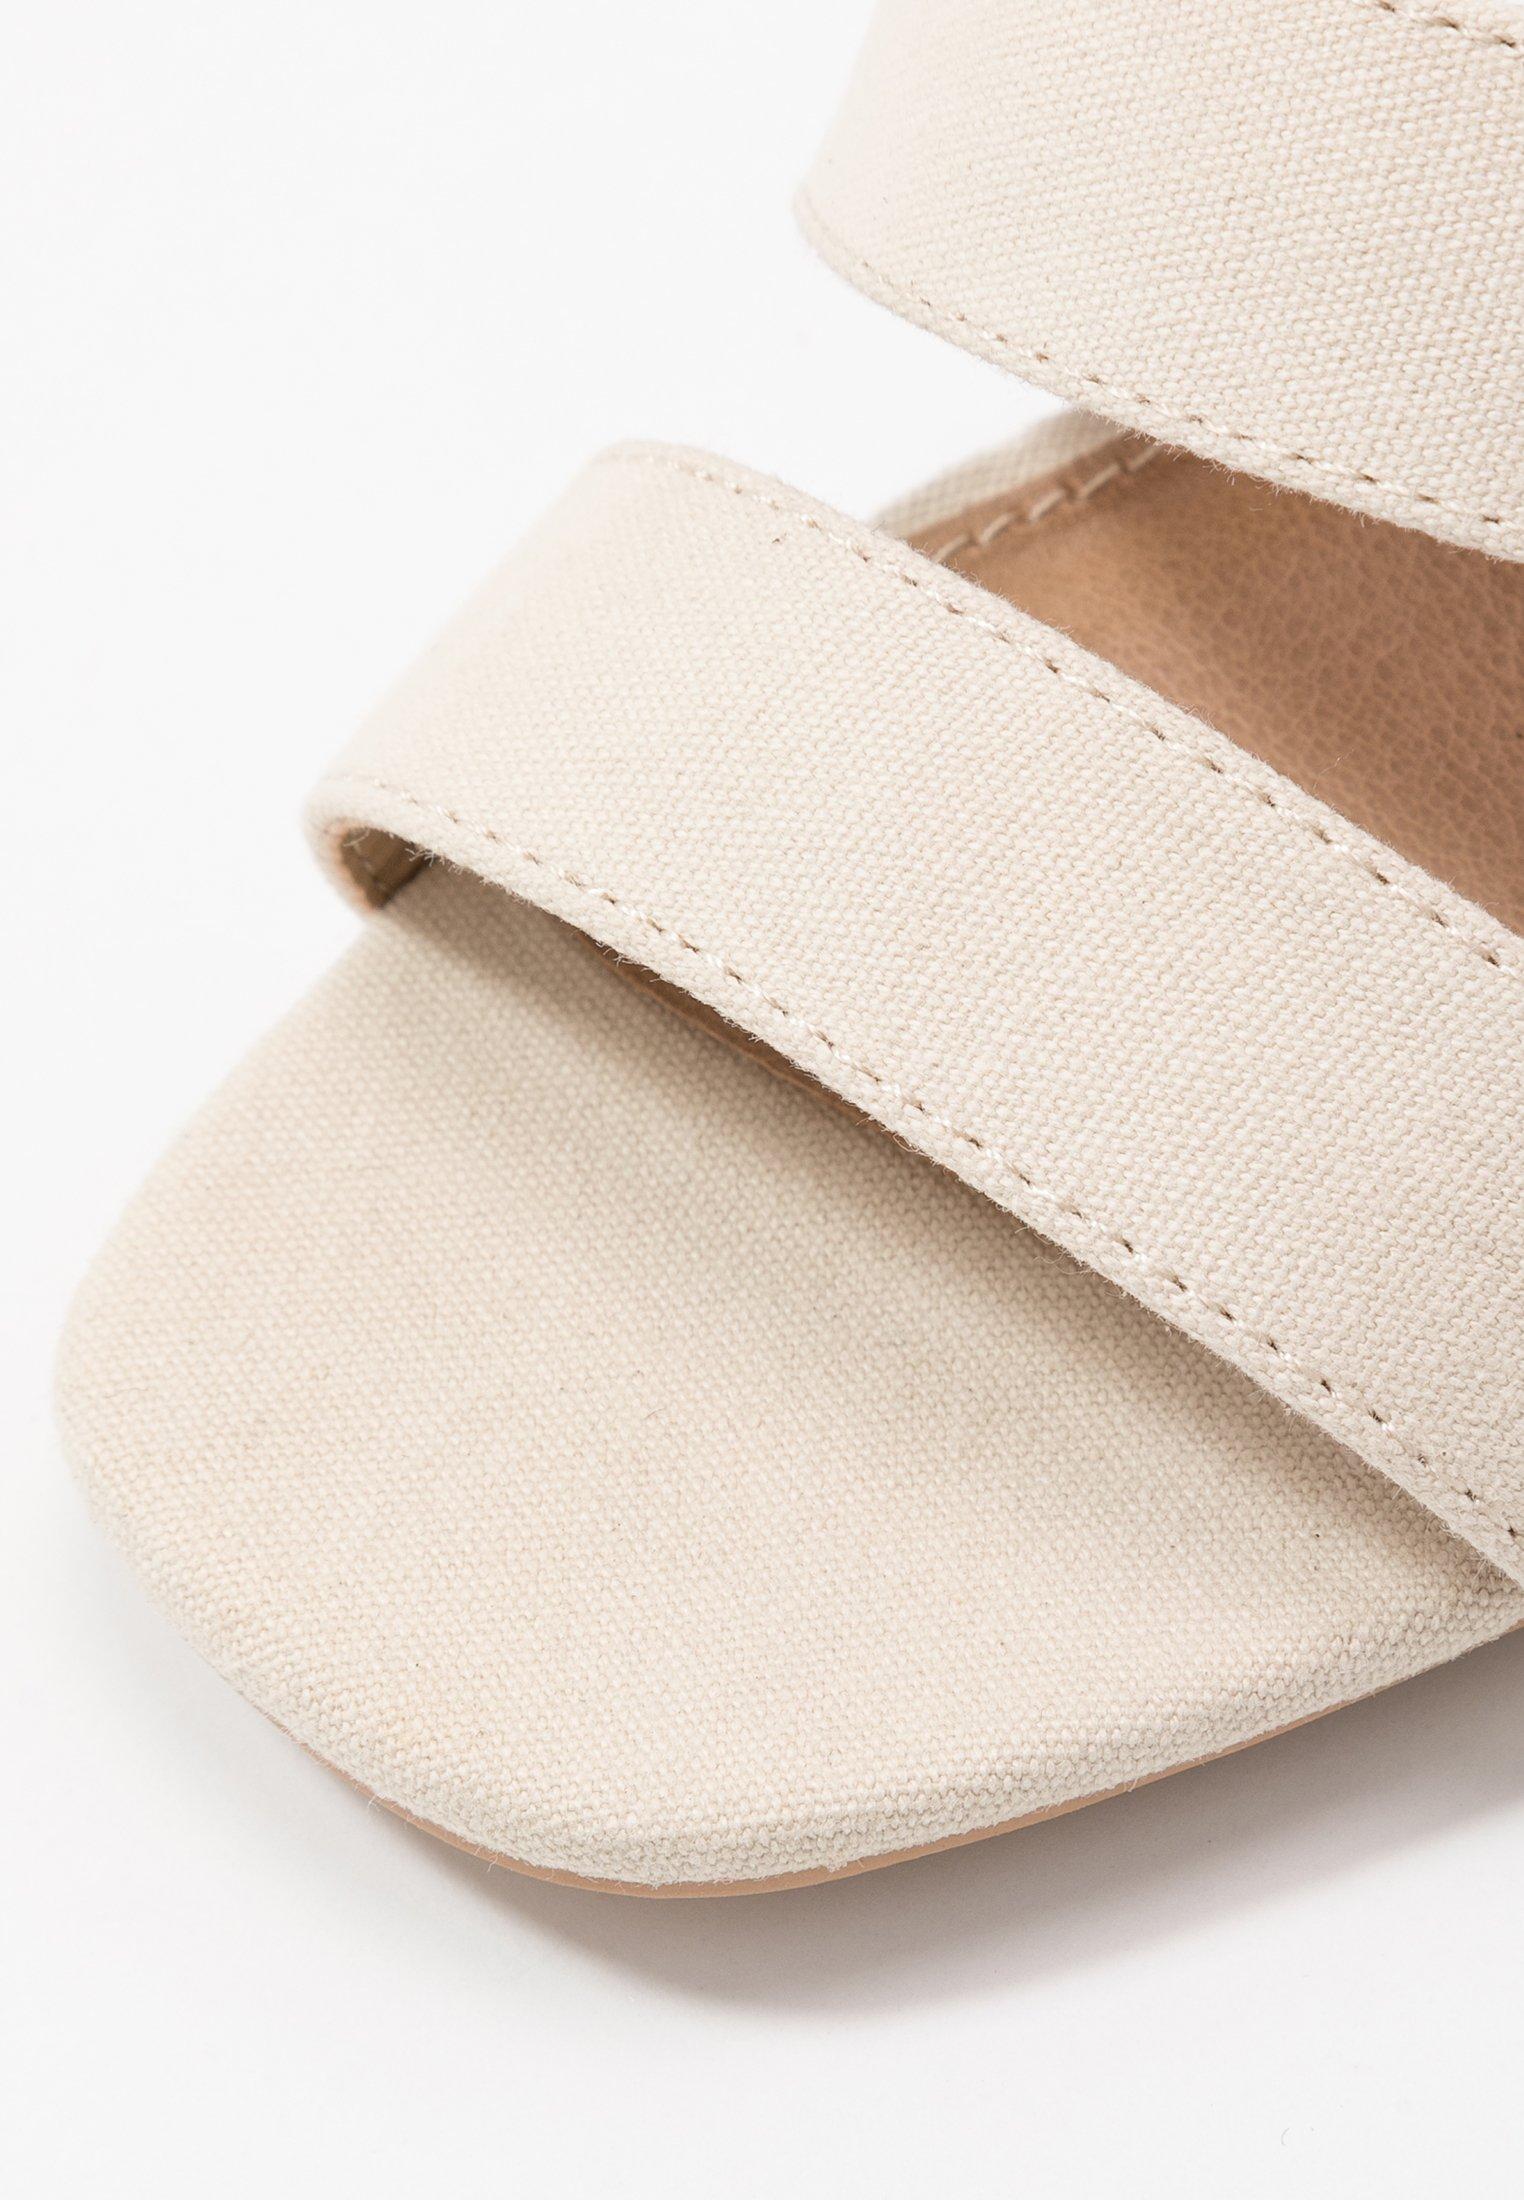 On À Santal Talons StrappySandales Cotton By Shoes Hauts Rubi Oat VMpzGSqU